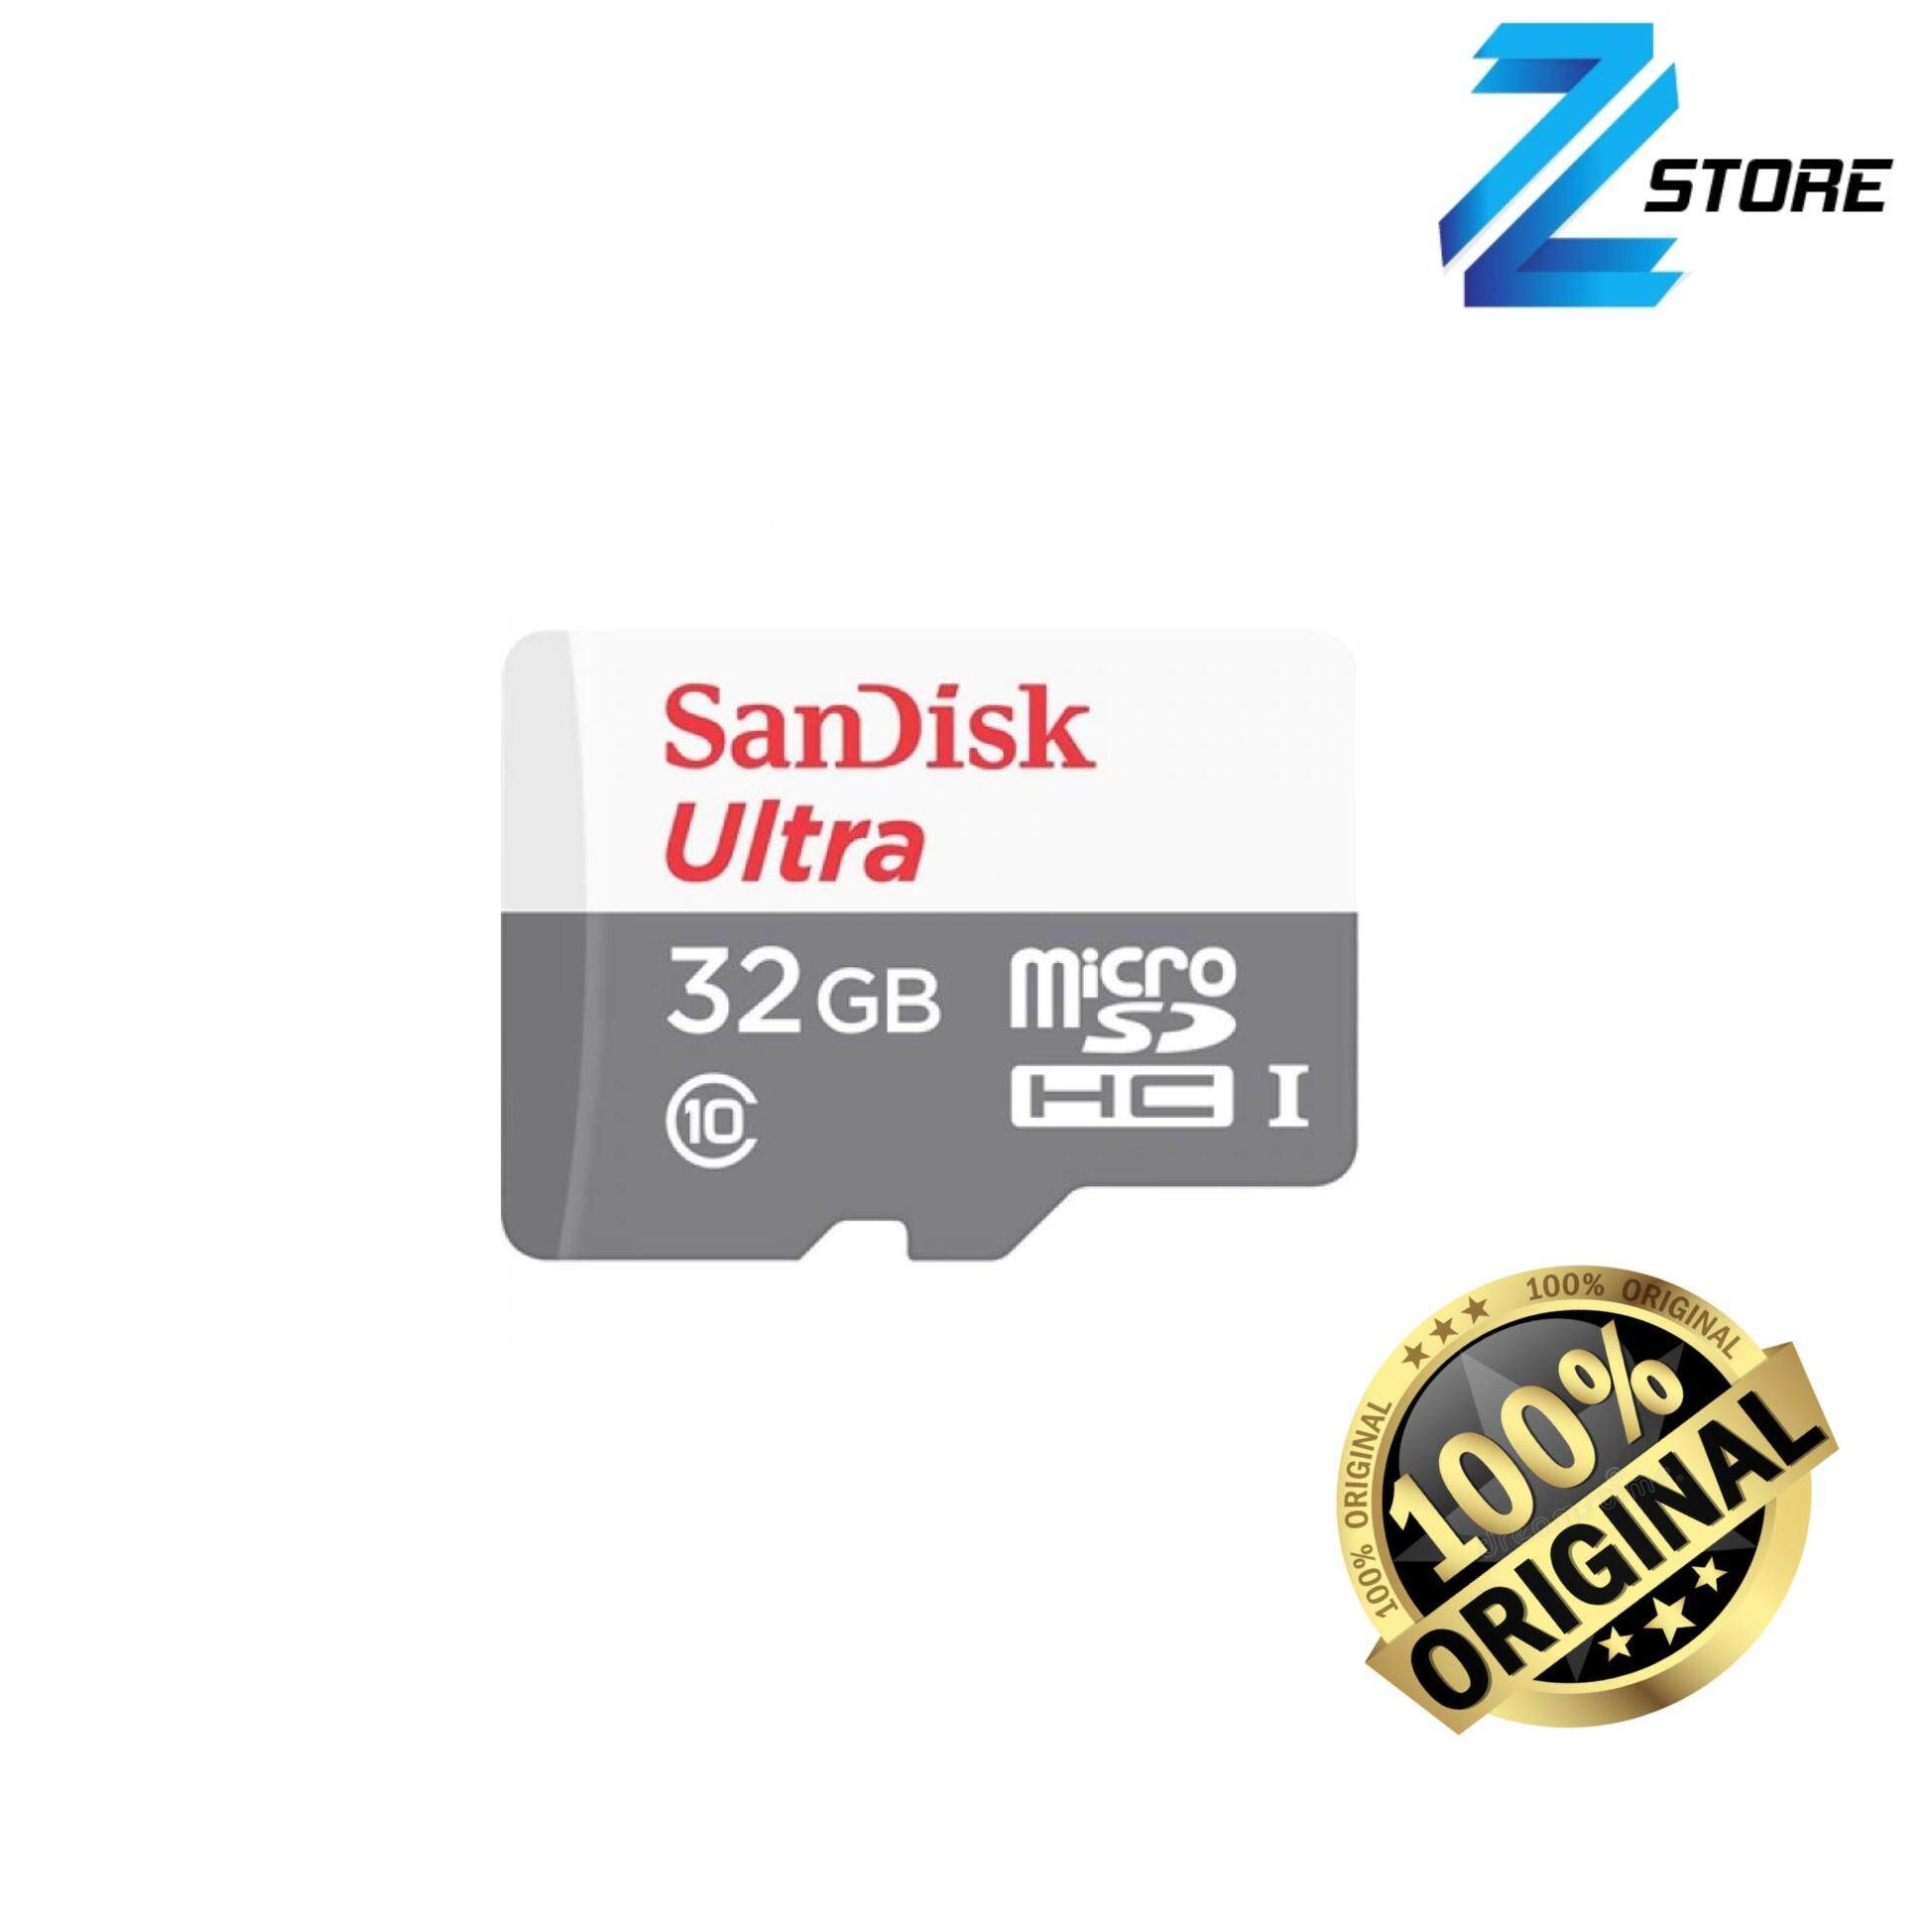 Sandisk Ultra Micro SD Class 10 32GB (48MB)